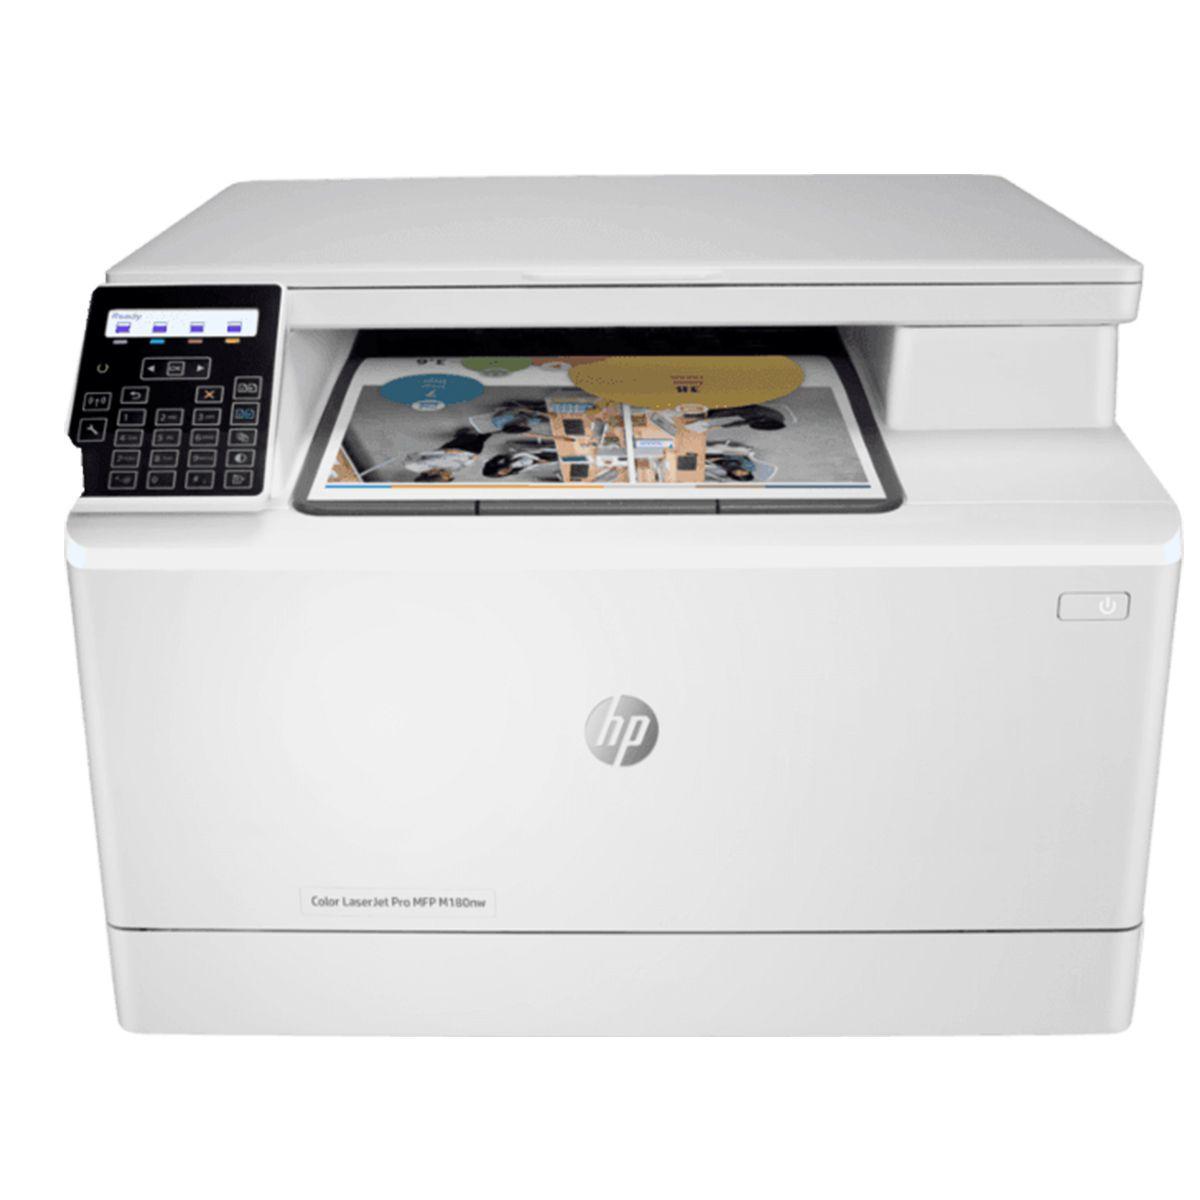 Impresora HP laserjet pro multifuncional color M180NW